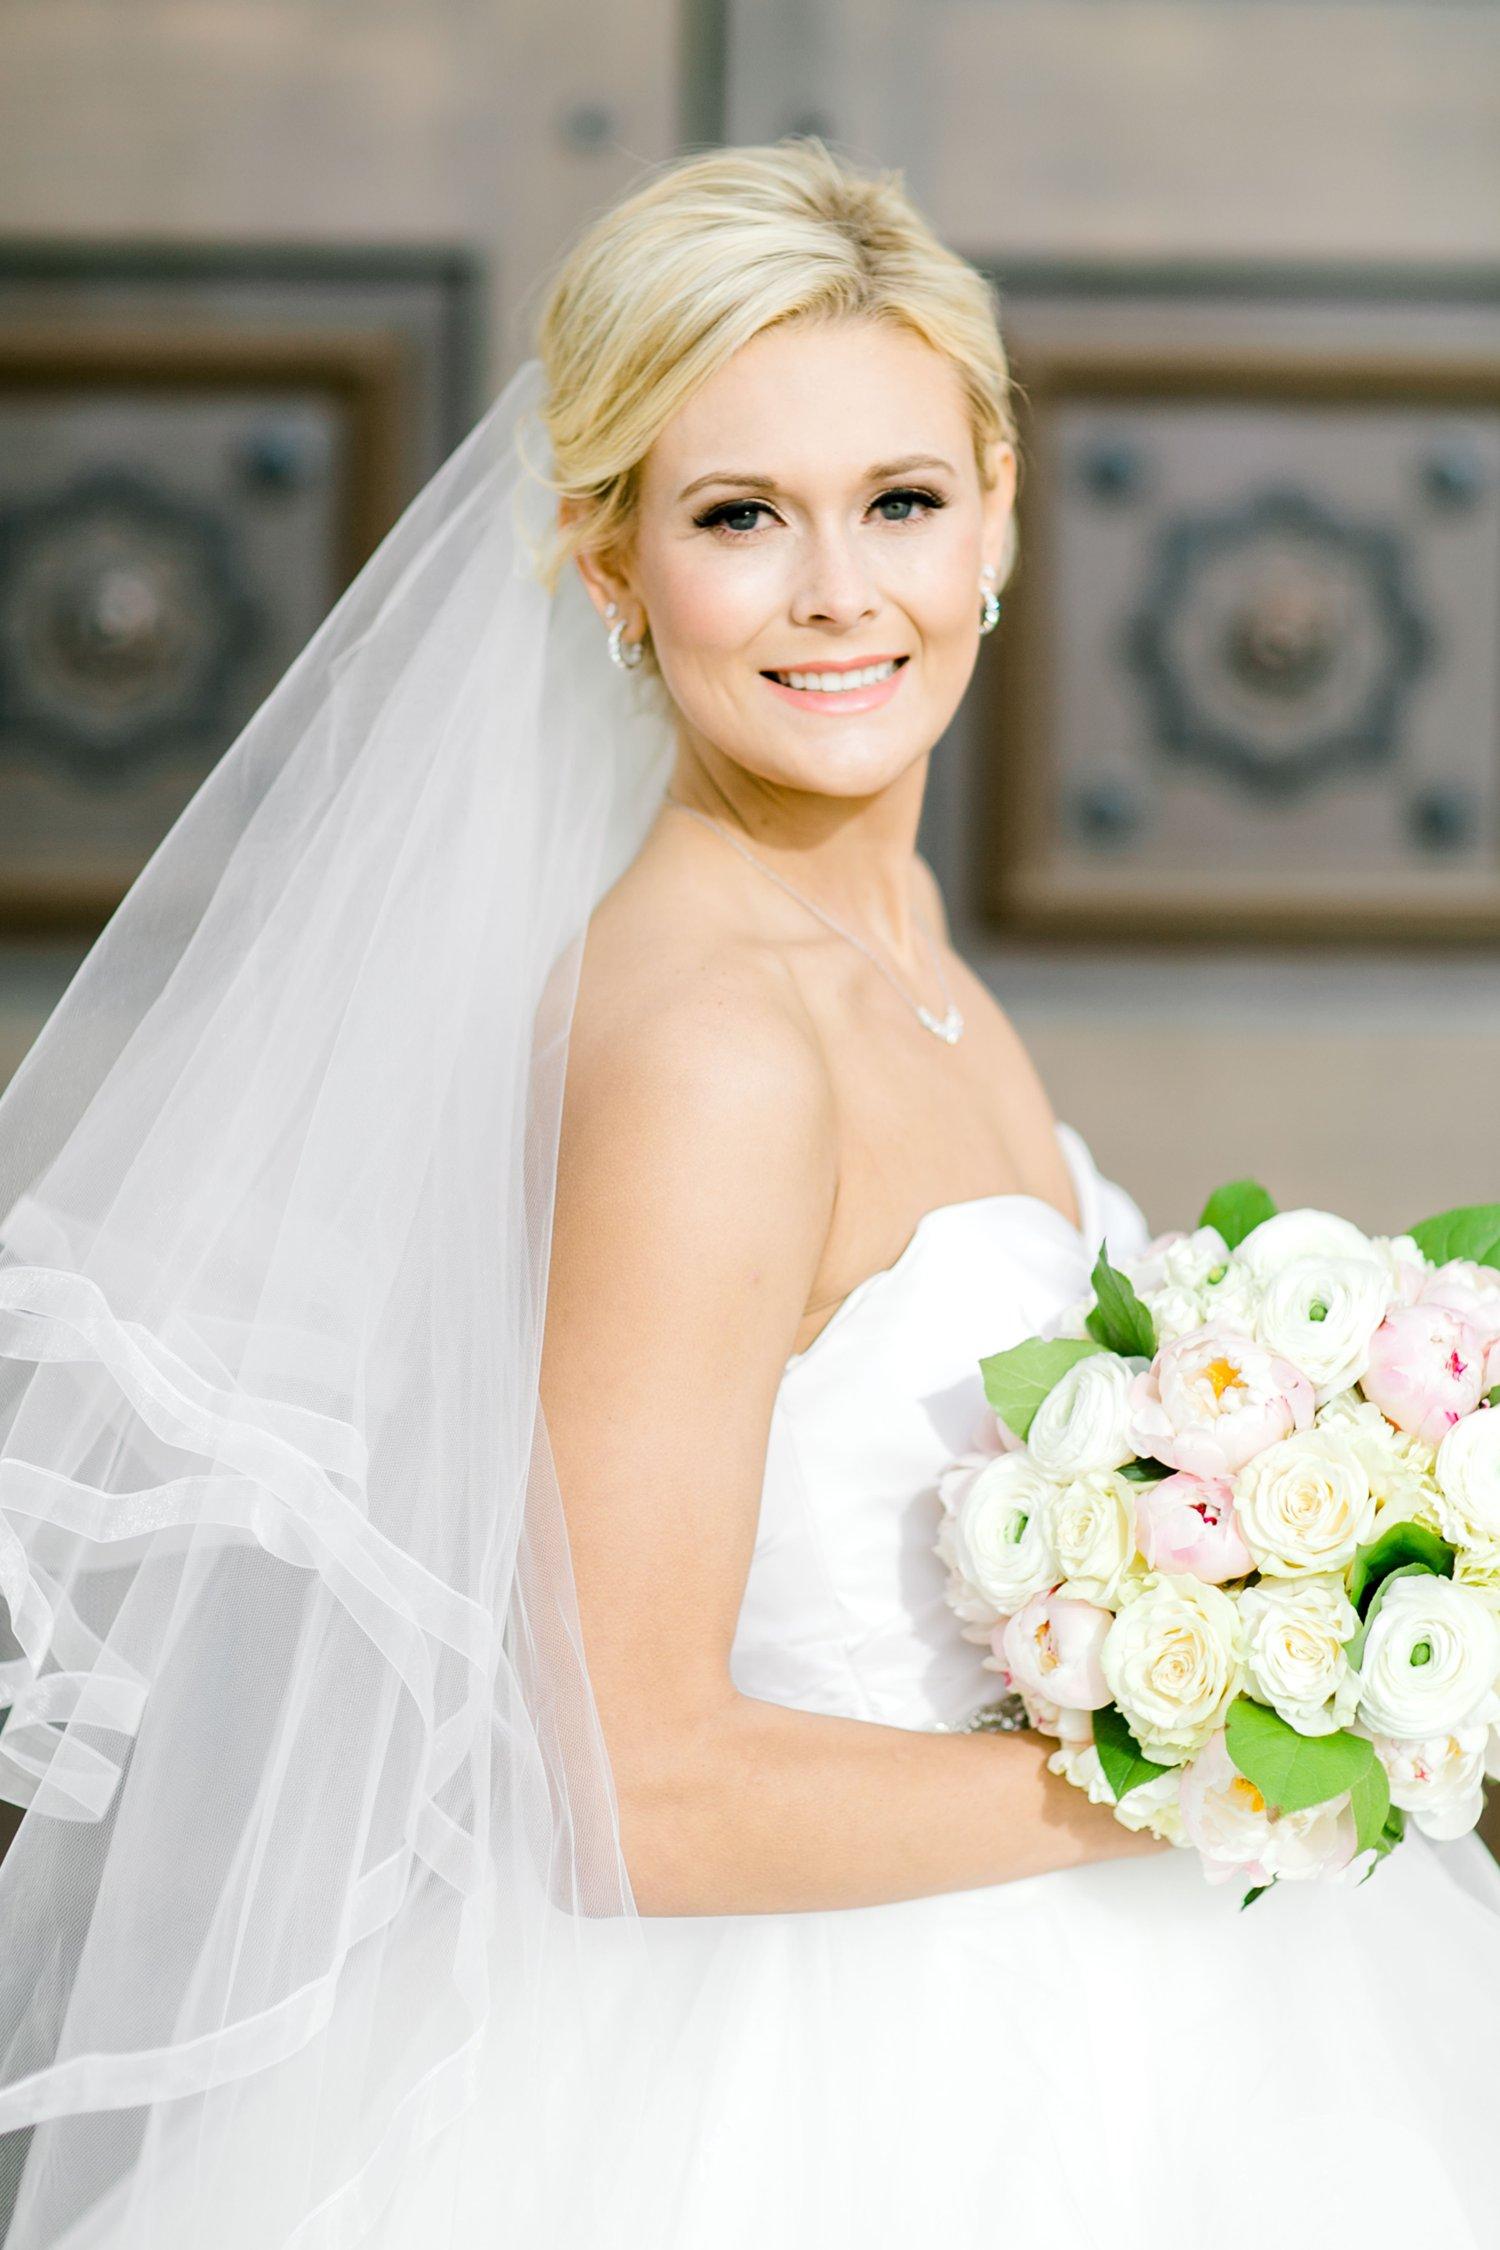 Taylor-Williams-Merket-Alumni-Center-Texas-Tech-Weddings-Lubbock-Photographer_0024.jpg